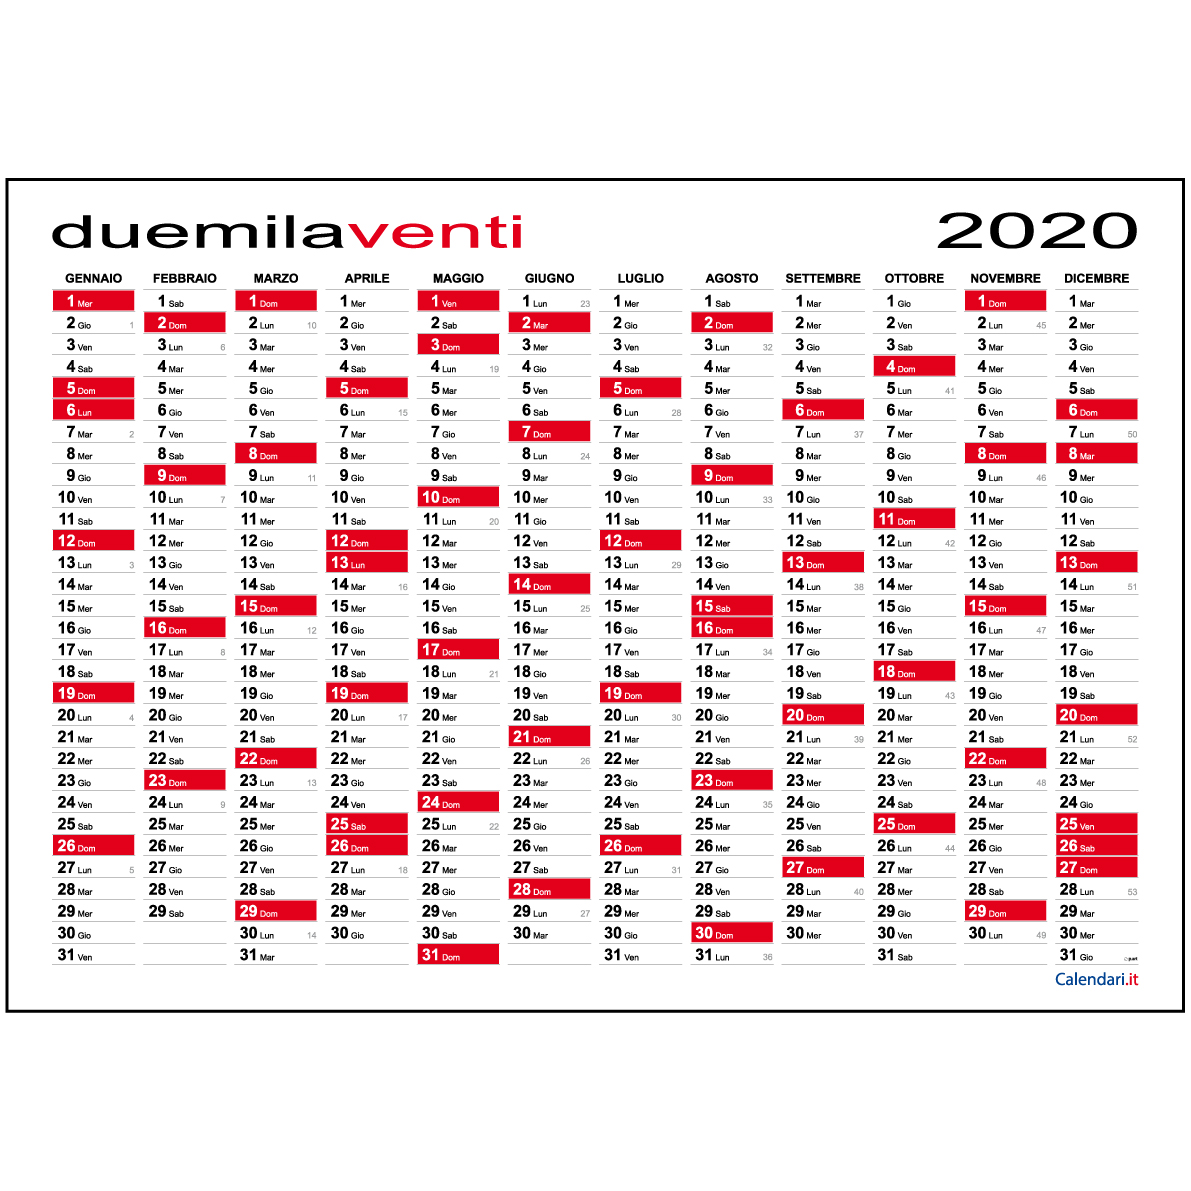 Calendario It.Calendario 2020 Planner Planning Da Muro 118x84 Cm Maxi O 84x60 Cm Standard Calendario 2020 Annuale